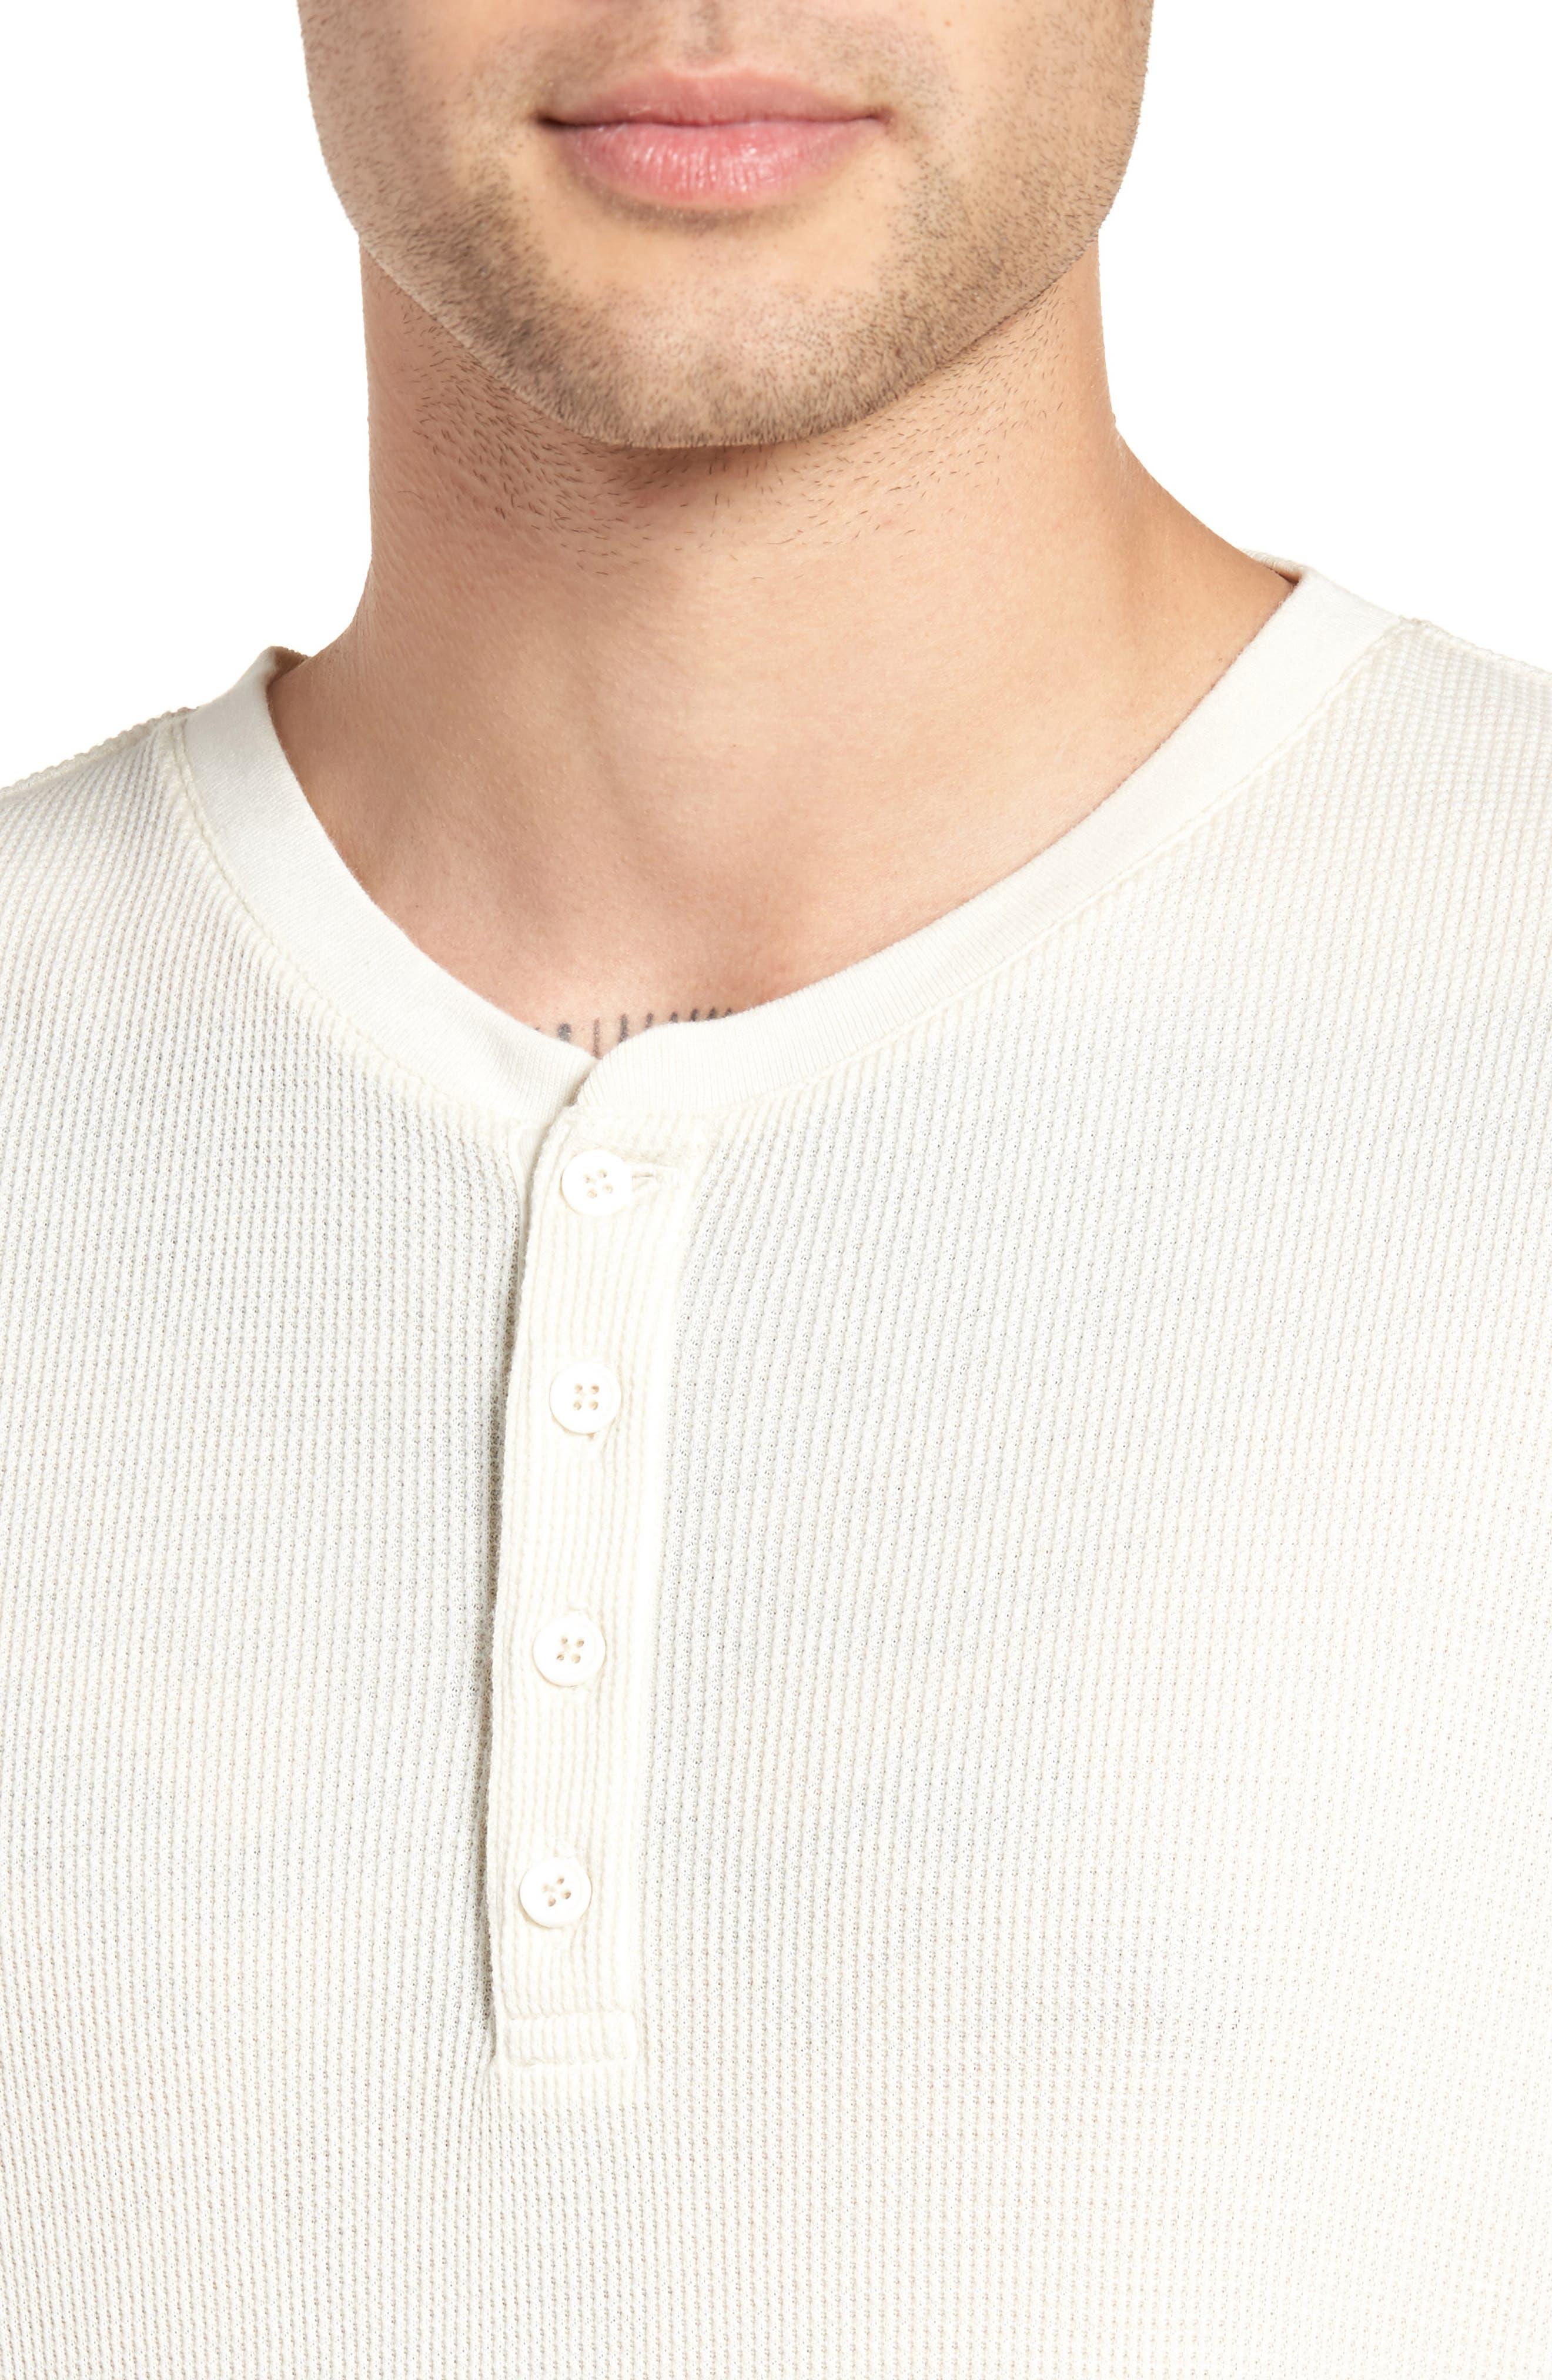 Thermal Knit Long Sleeve Henley T-Shirt,                             Alternate thumbnail 4, color,                             101